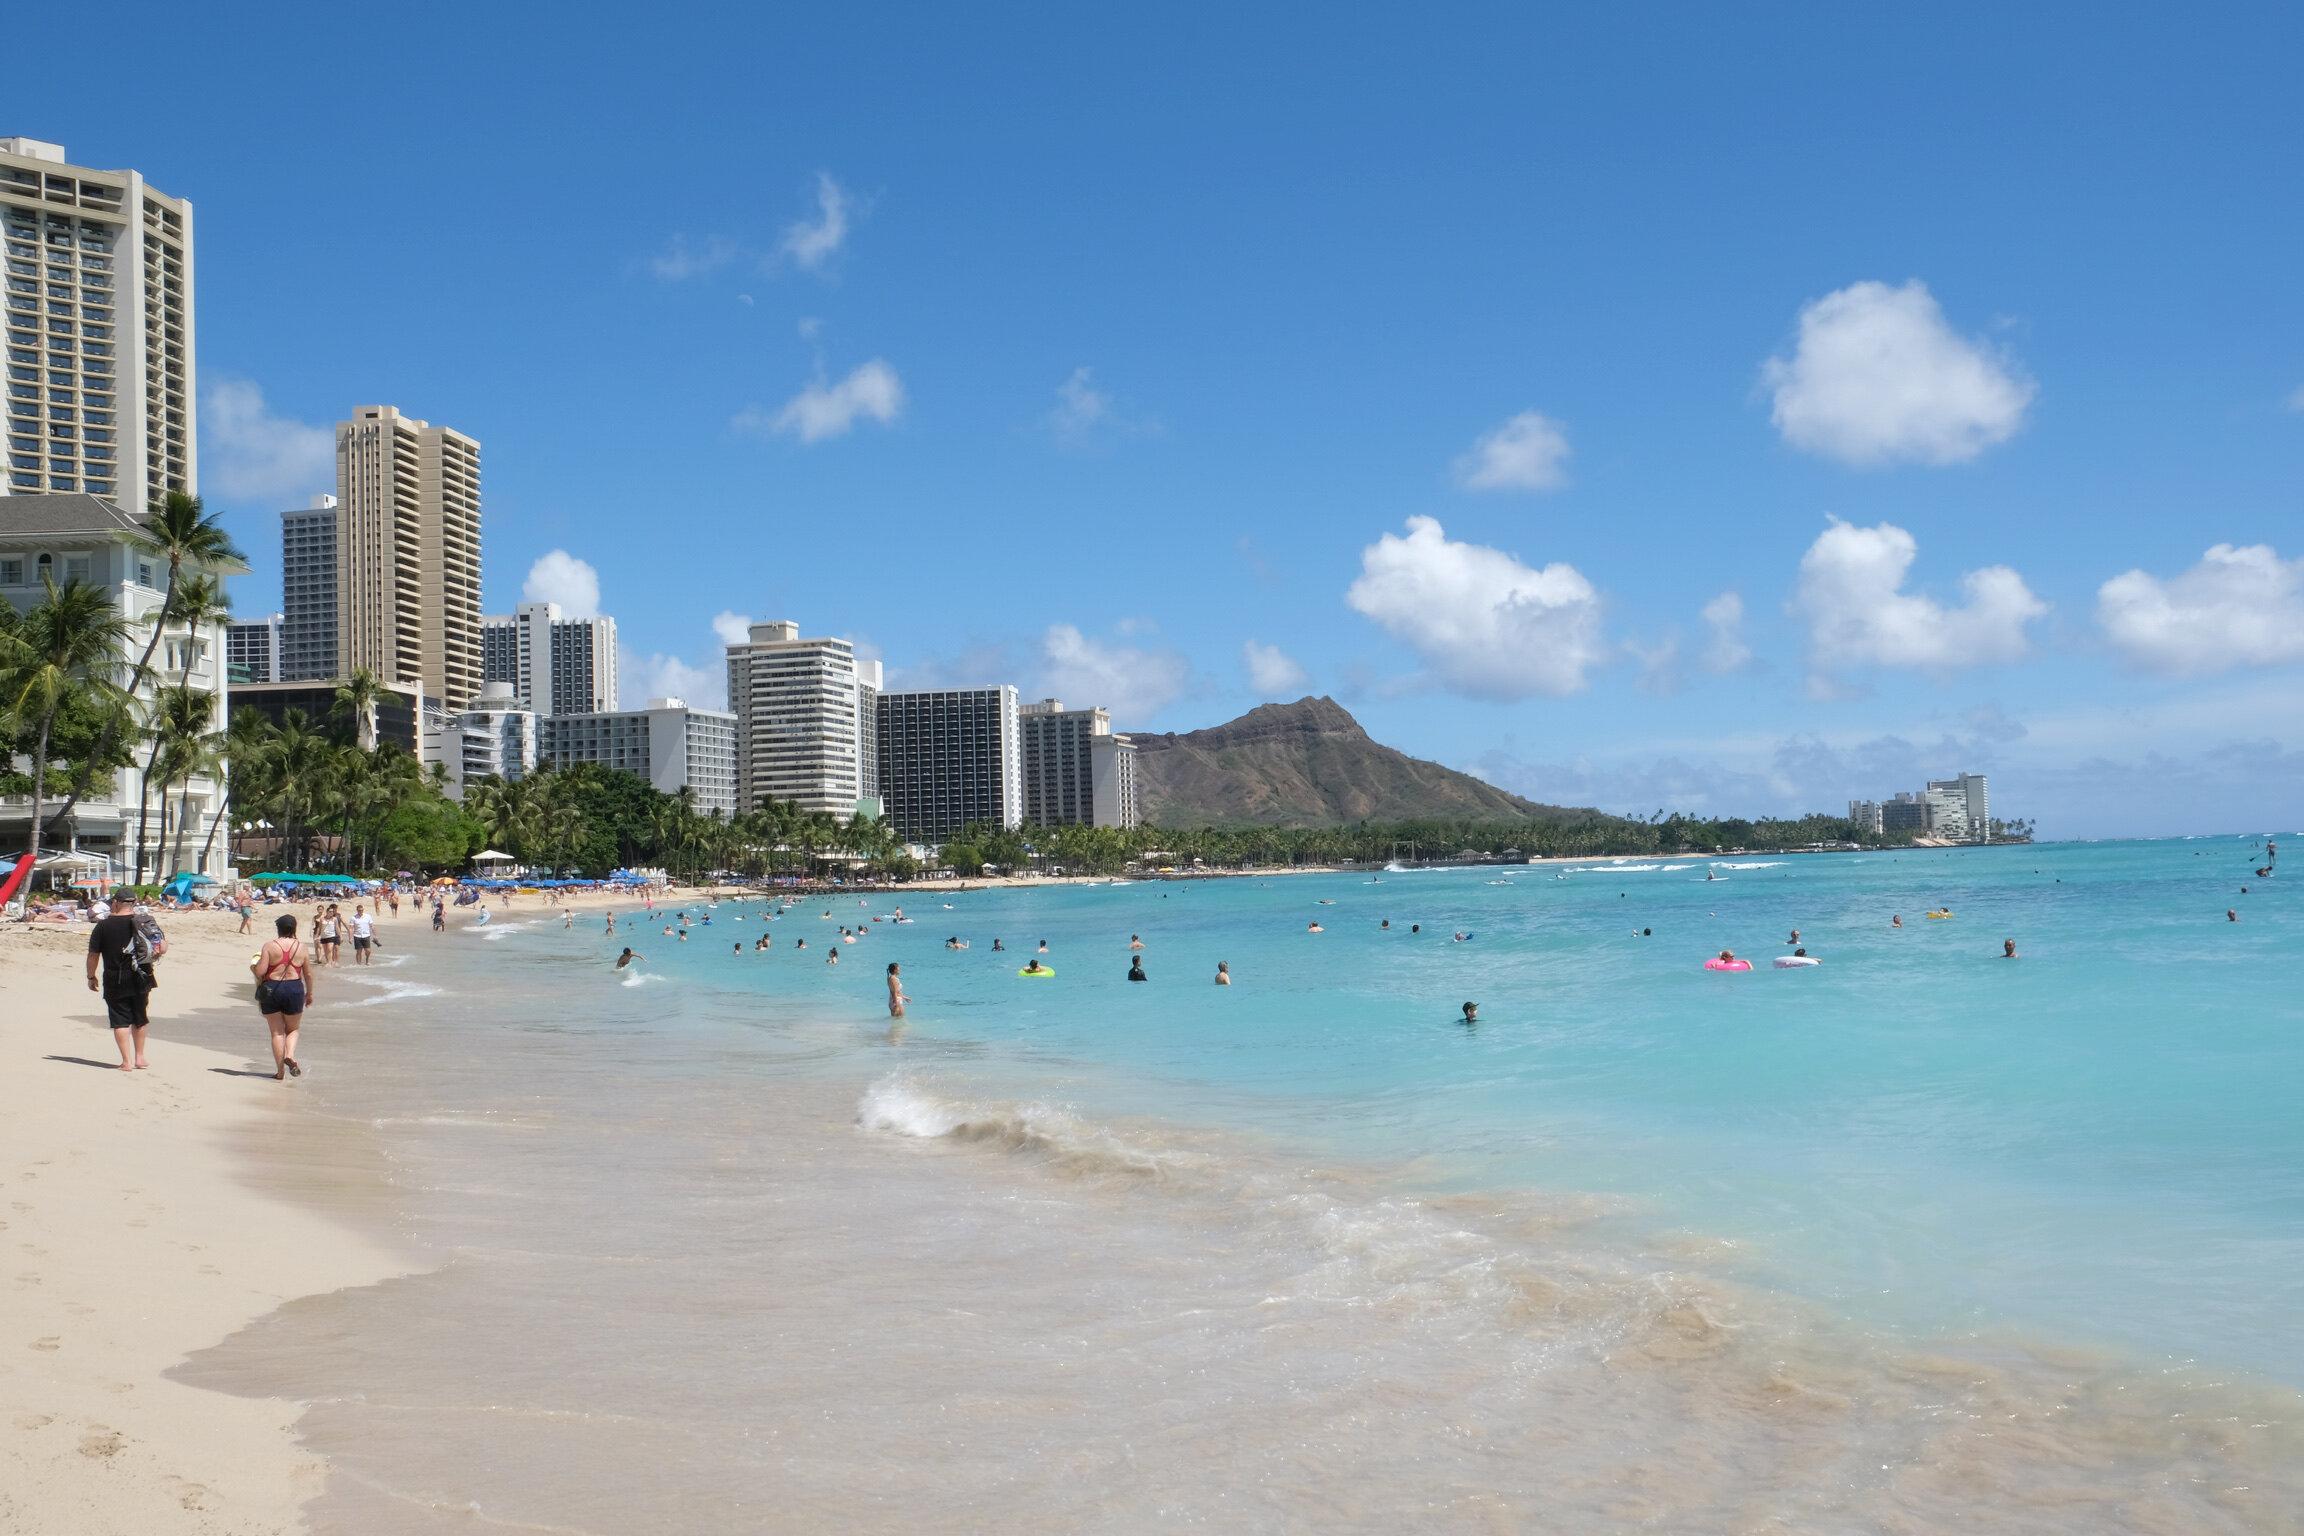 Hawaii-waikiki-beach-travel-traveltips-blog-itinerary-agenda